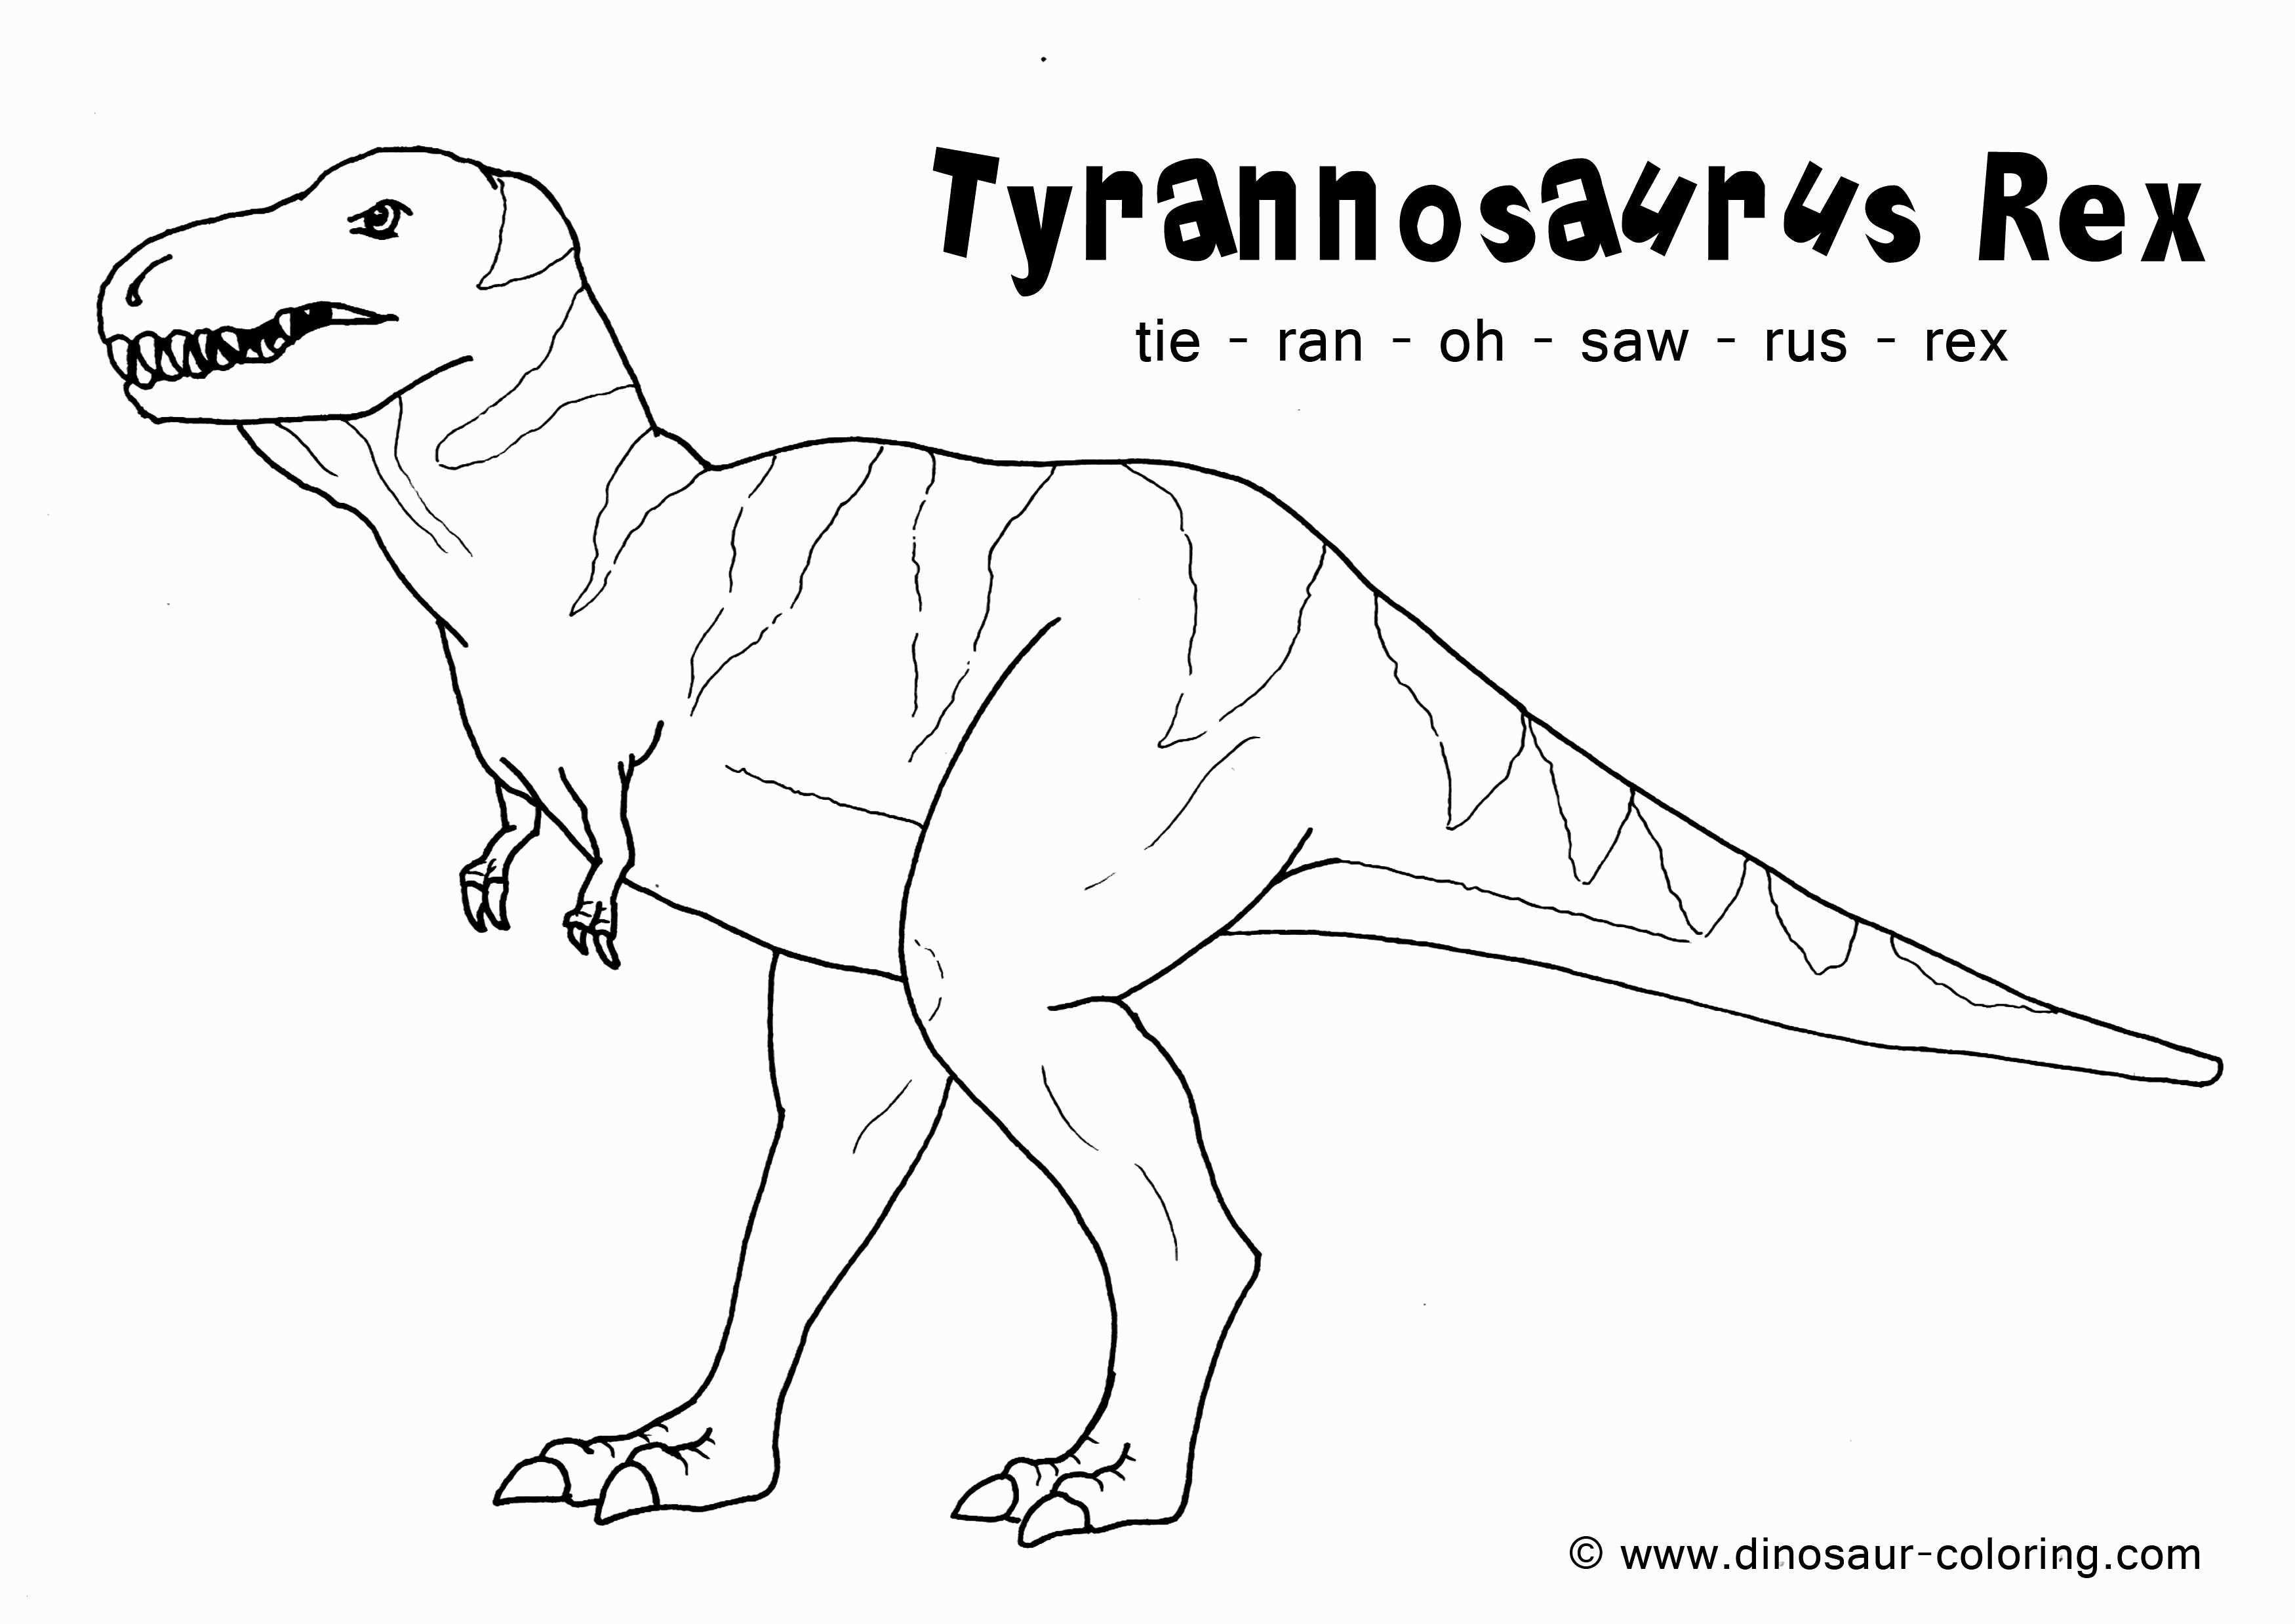 Tyrannosaurus Rex Ausmalbild Frisch Indominus Rex Coloring Page Lovely Tyrannosaurus Rex Ausmalbilder Fotografieren